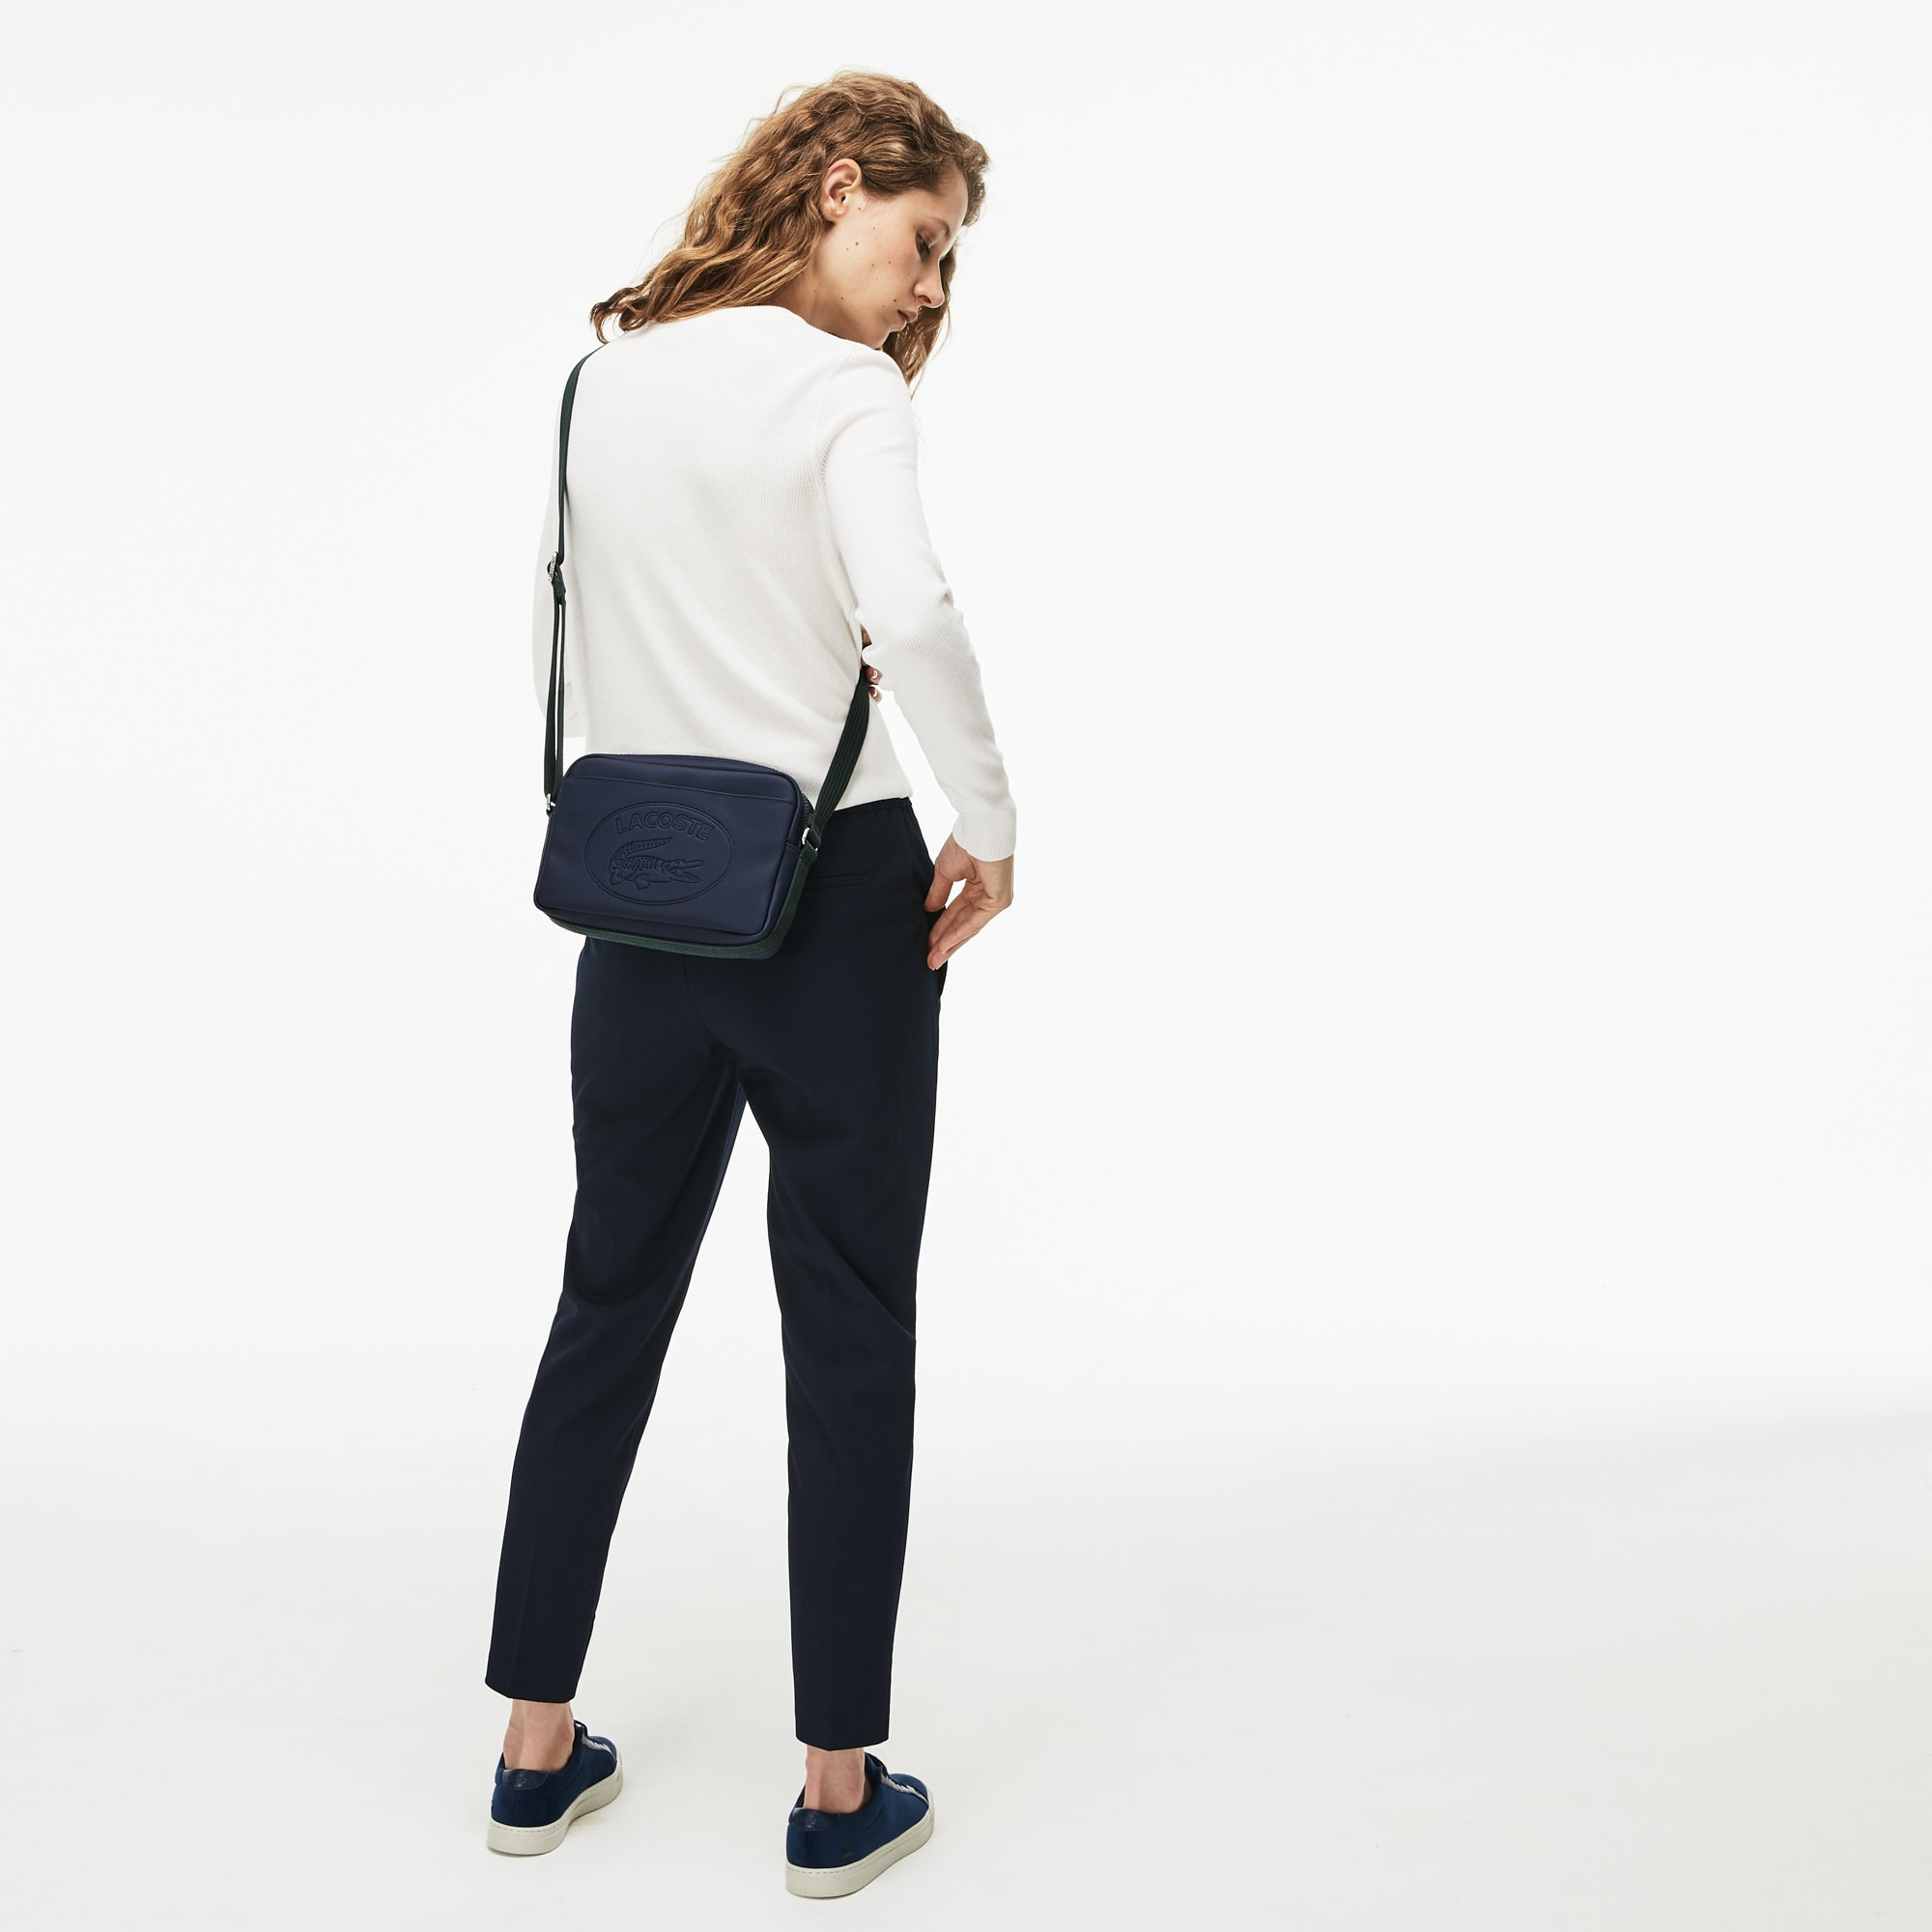 Damen CLASSIC zweifarbige Schultertasche